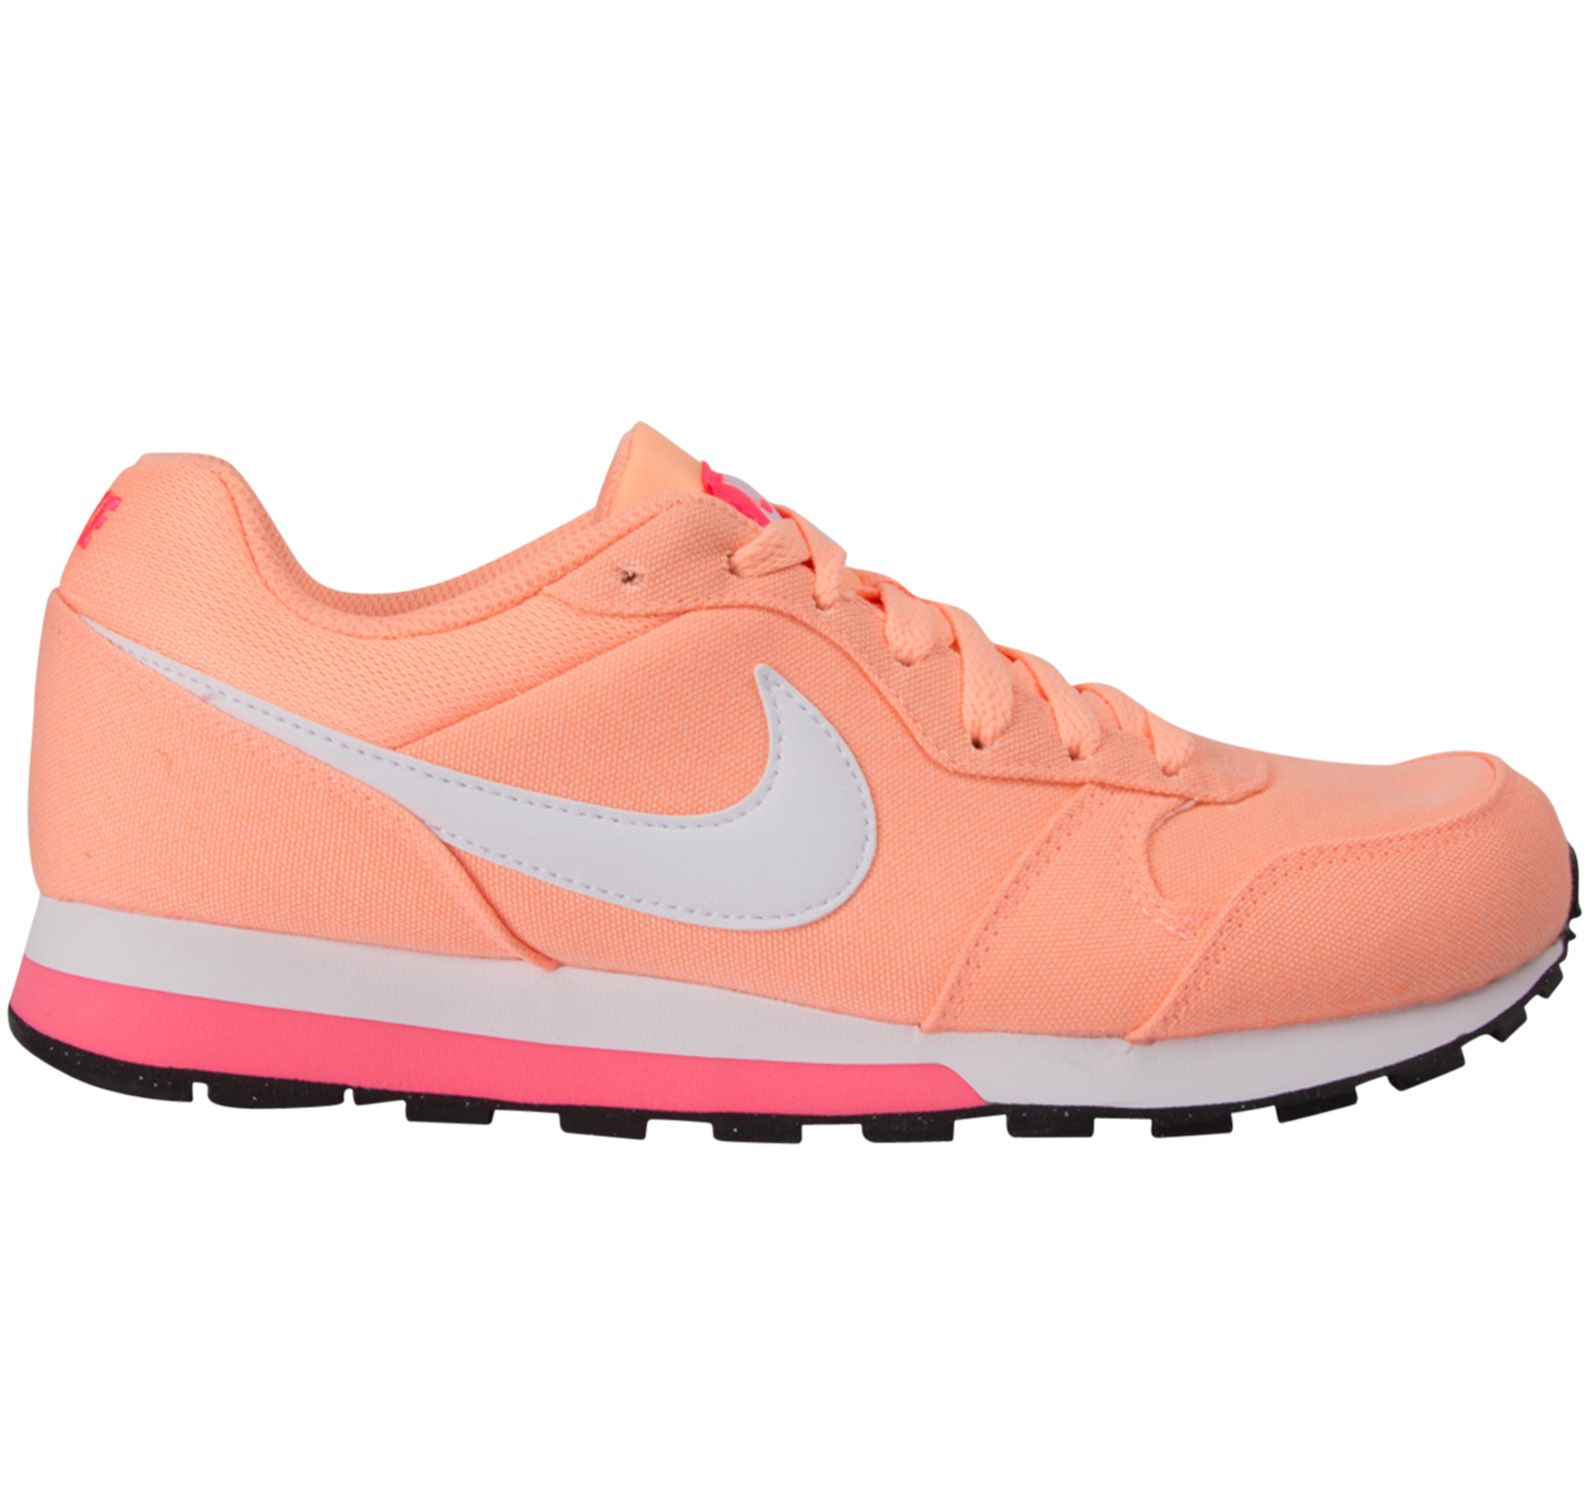 Wmns Nike Md Runner 2, Sunset Glow/White-Racer Pink, 36